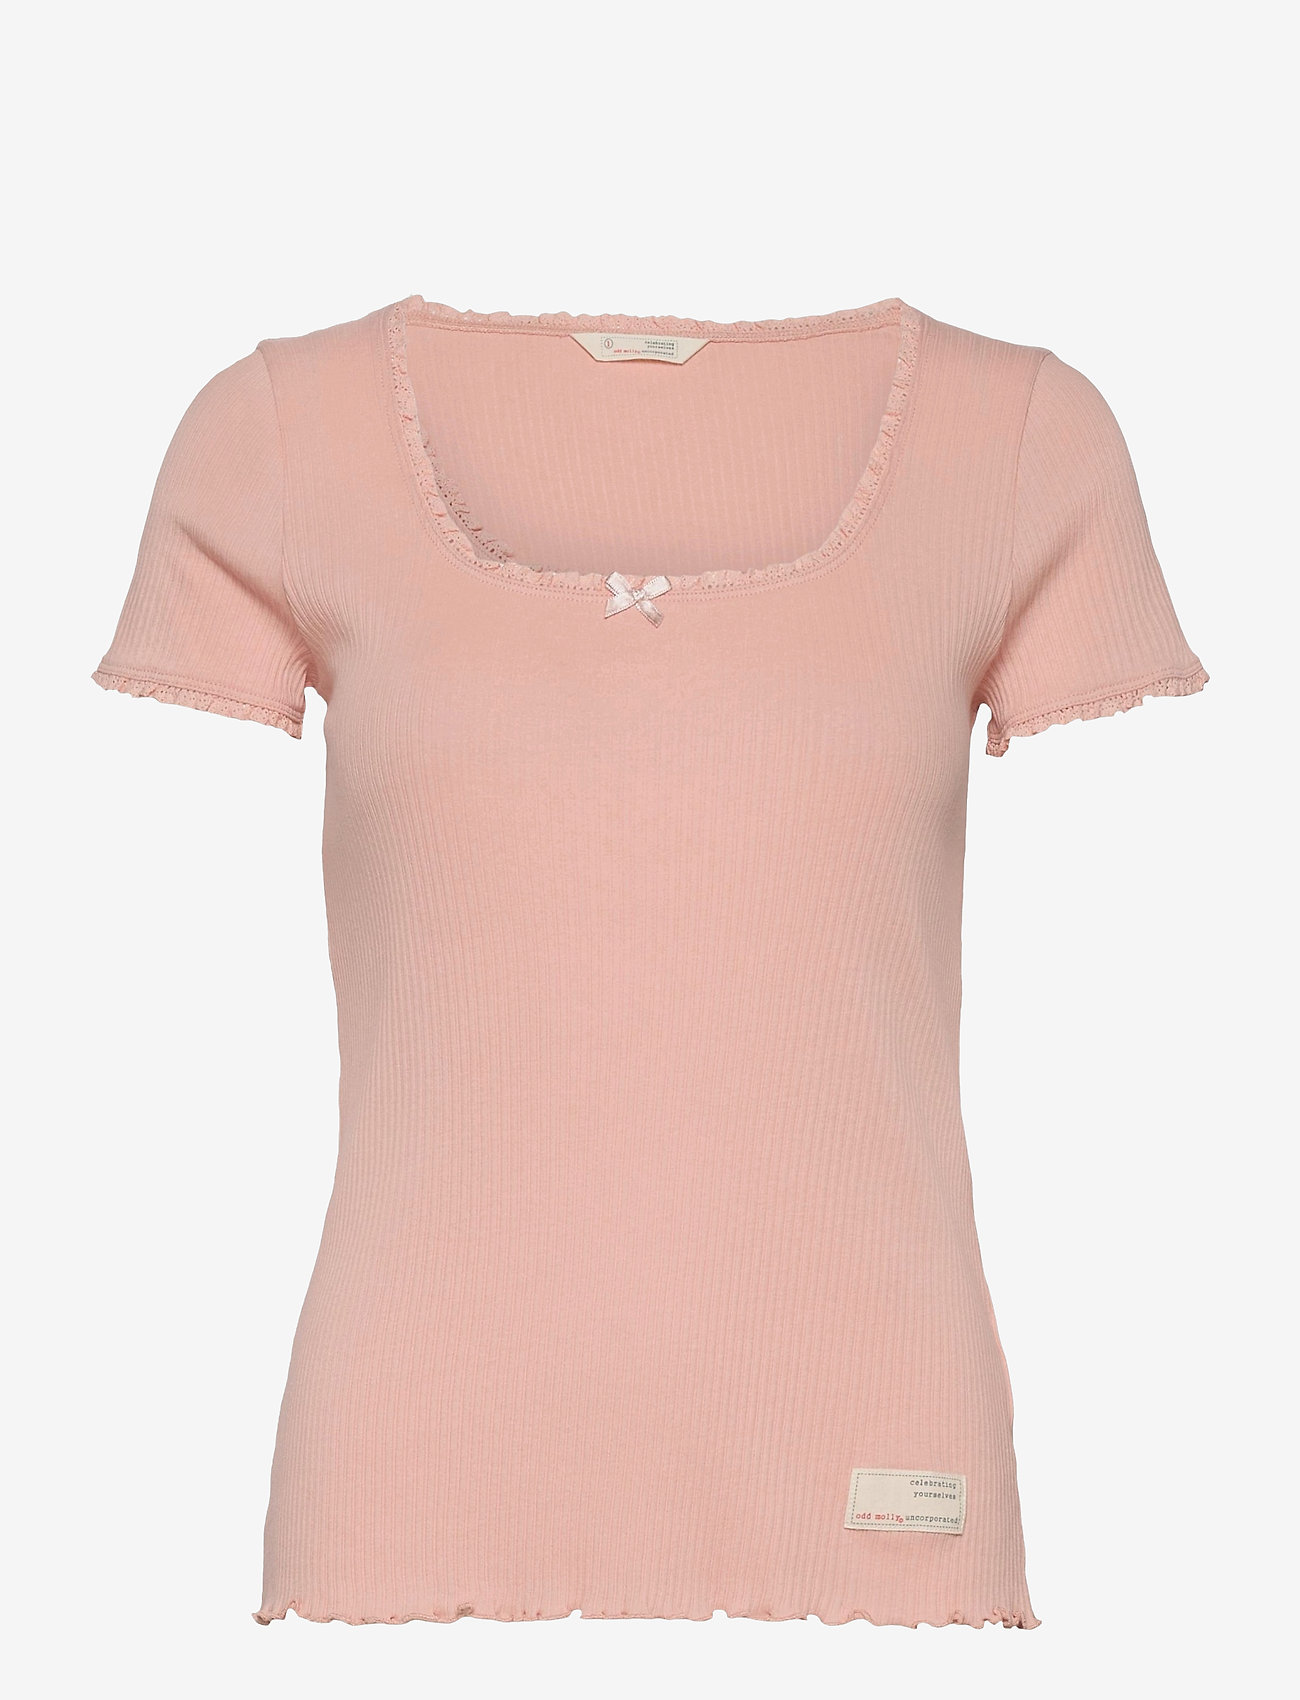 ODD MOLLY - Magda Top - t-shirts - pink conch - 1